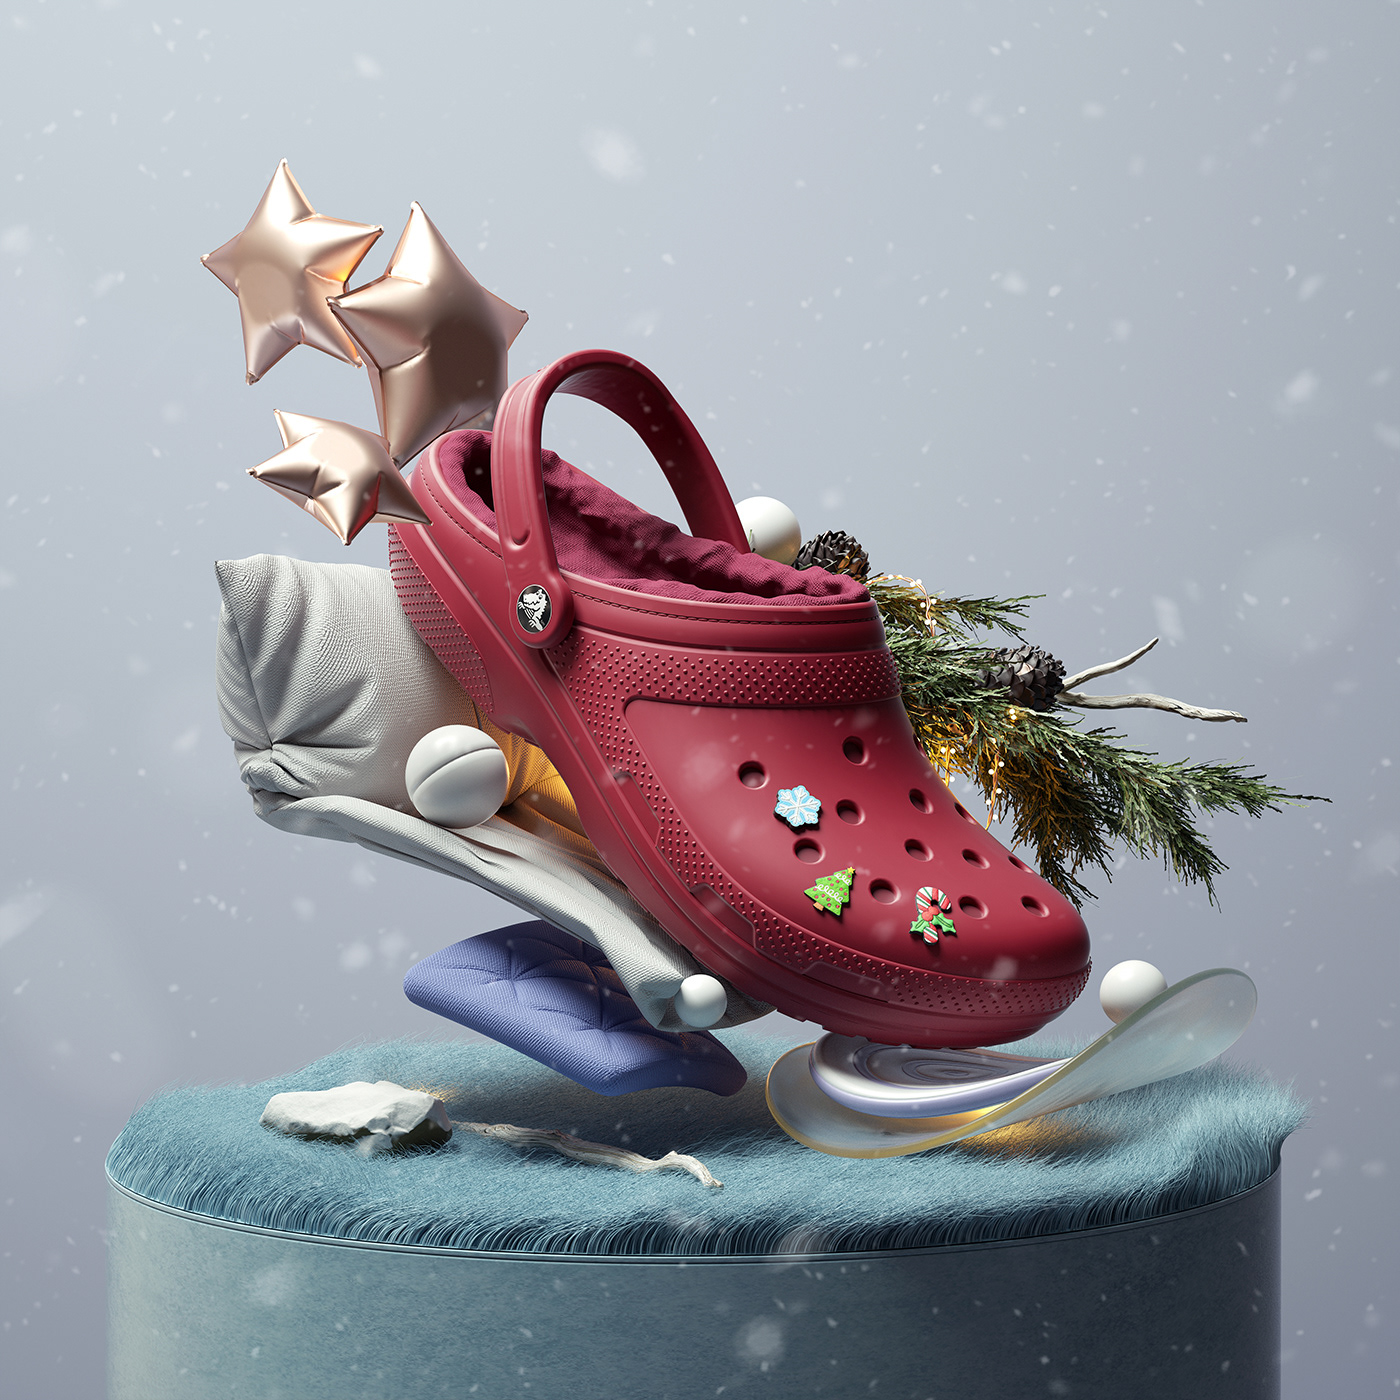 Crocs Shoes 3D design art modern cinema4d ILLUSTRATION  inspirations adobe composition